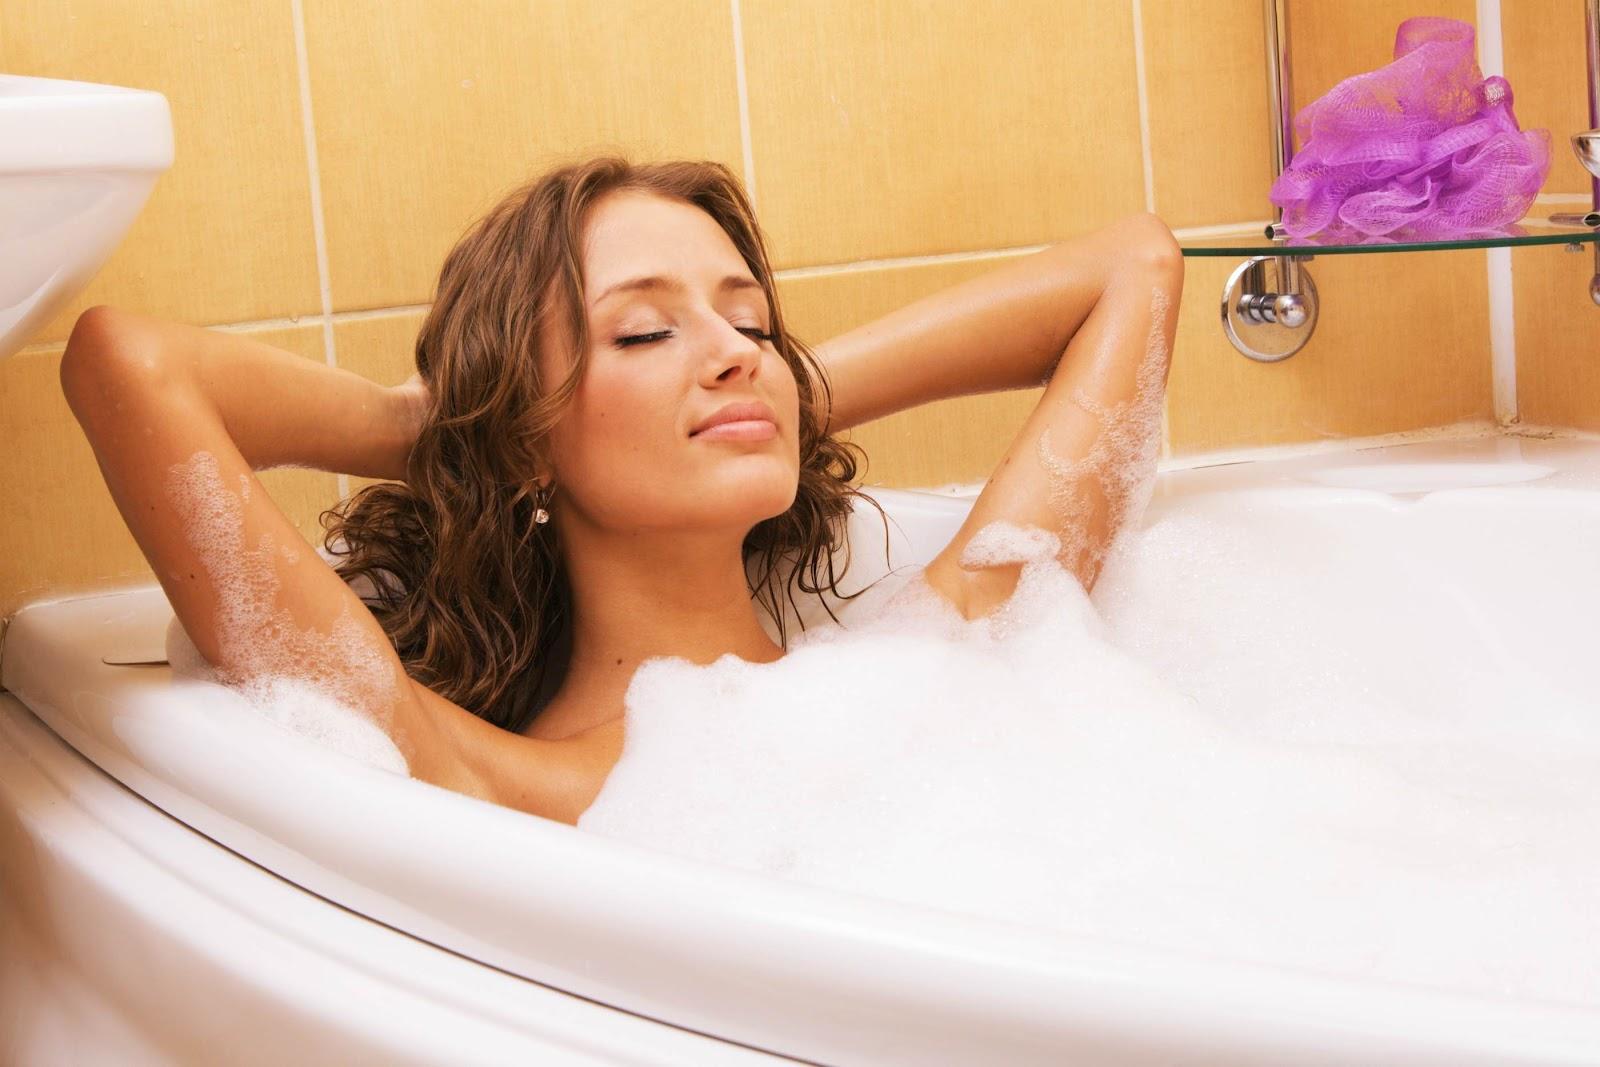 Love healthy boundaries aromatherapy bubble bath